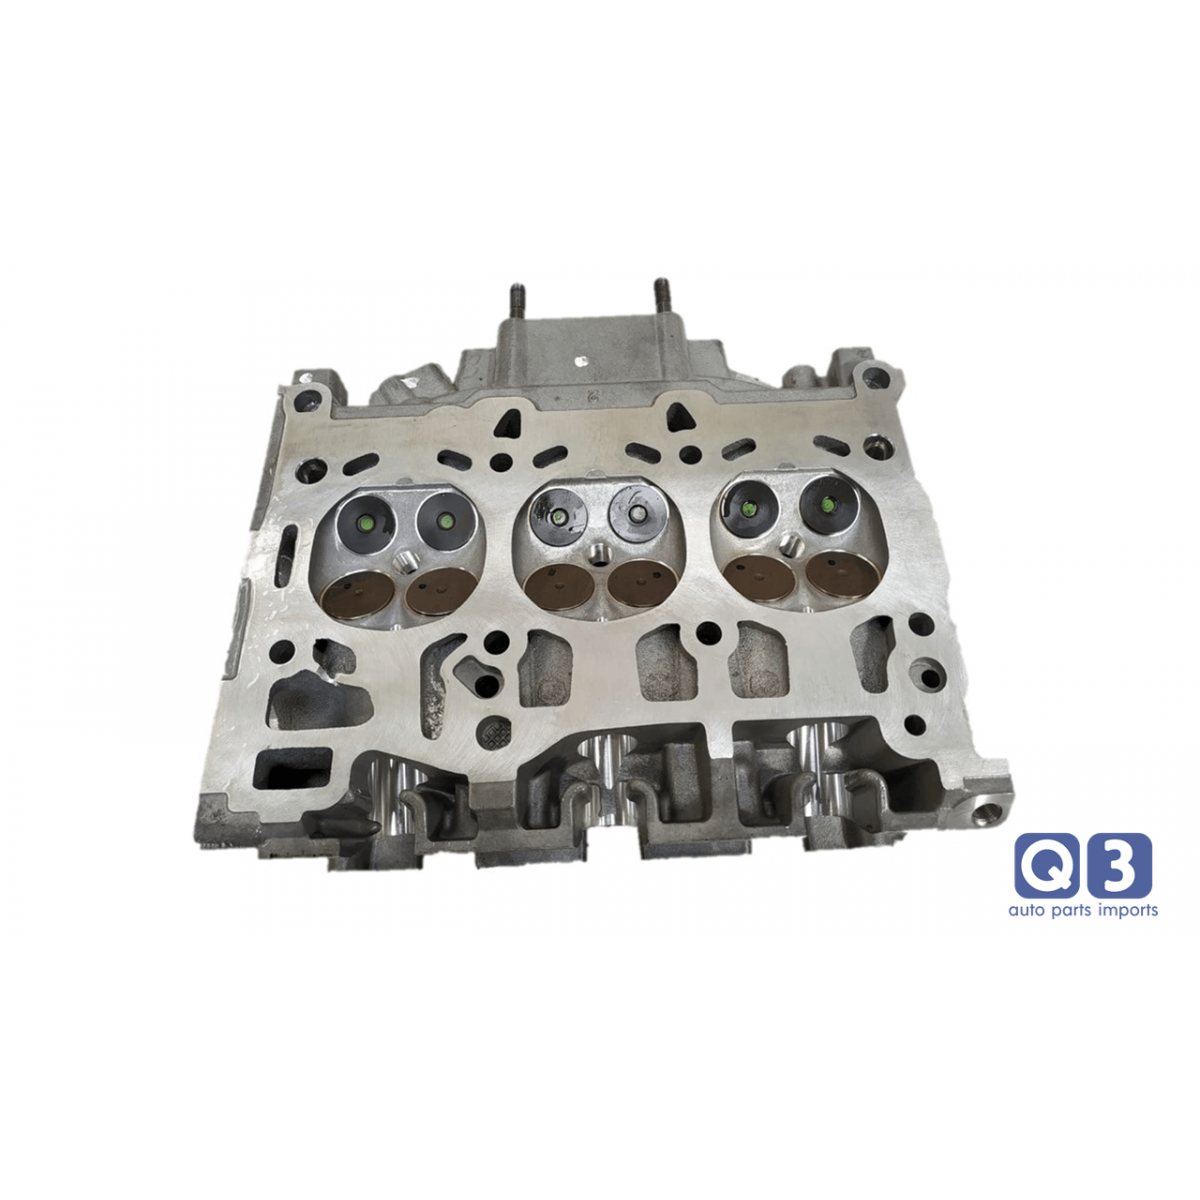 Cabeçote Volkswagen Up 1.0 TSI 12V - Motor DHSB Turbo 3CC Número Original 04C103404